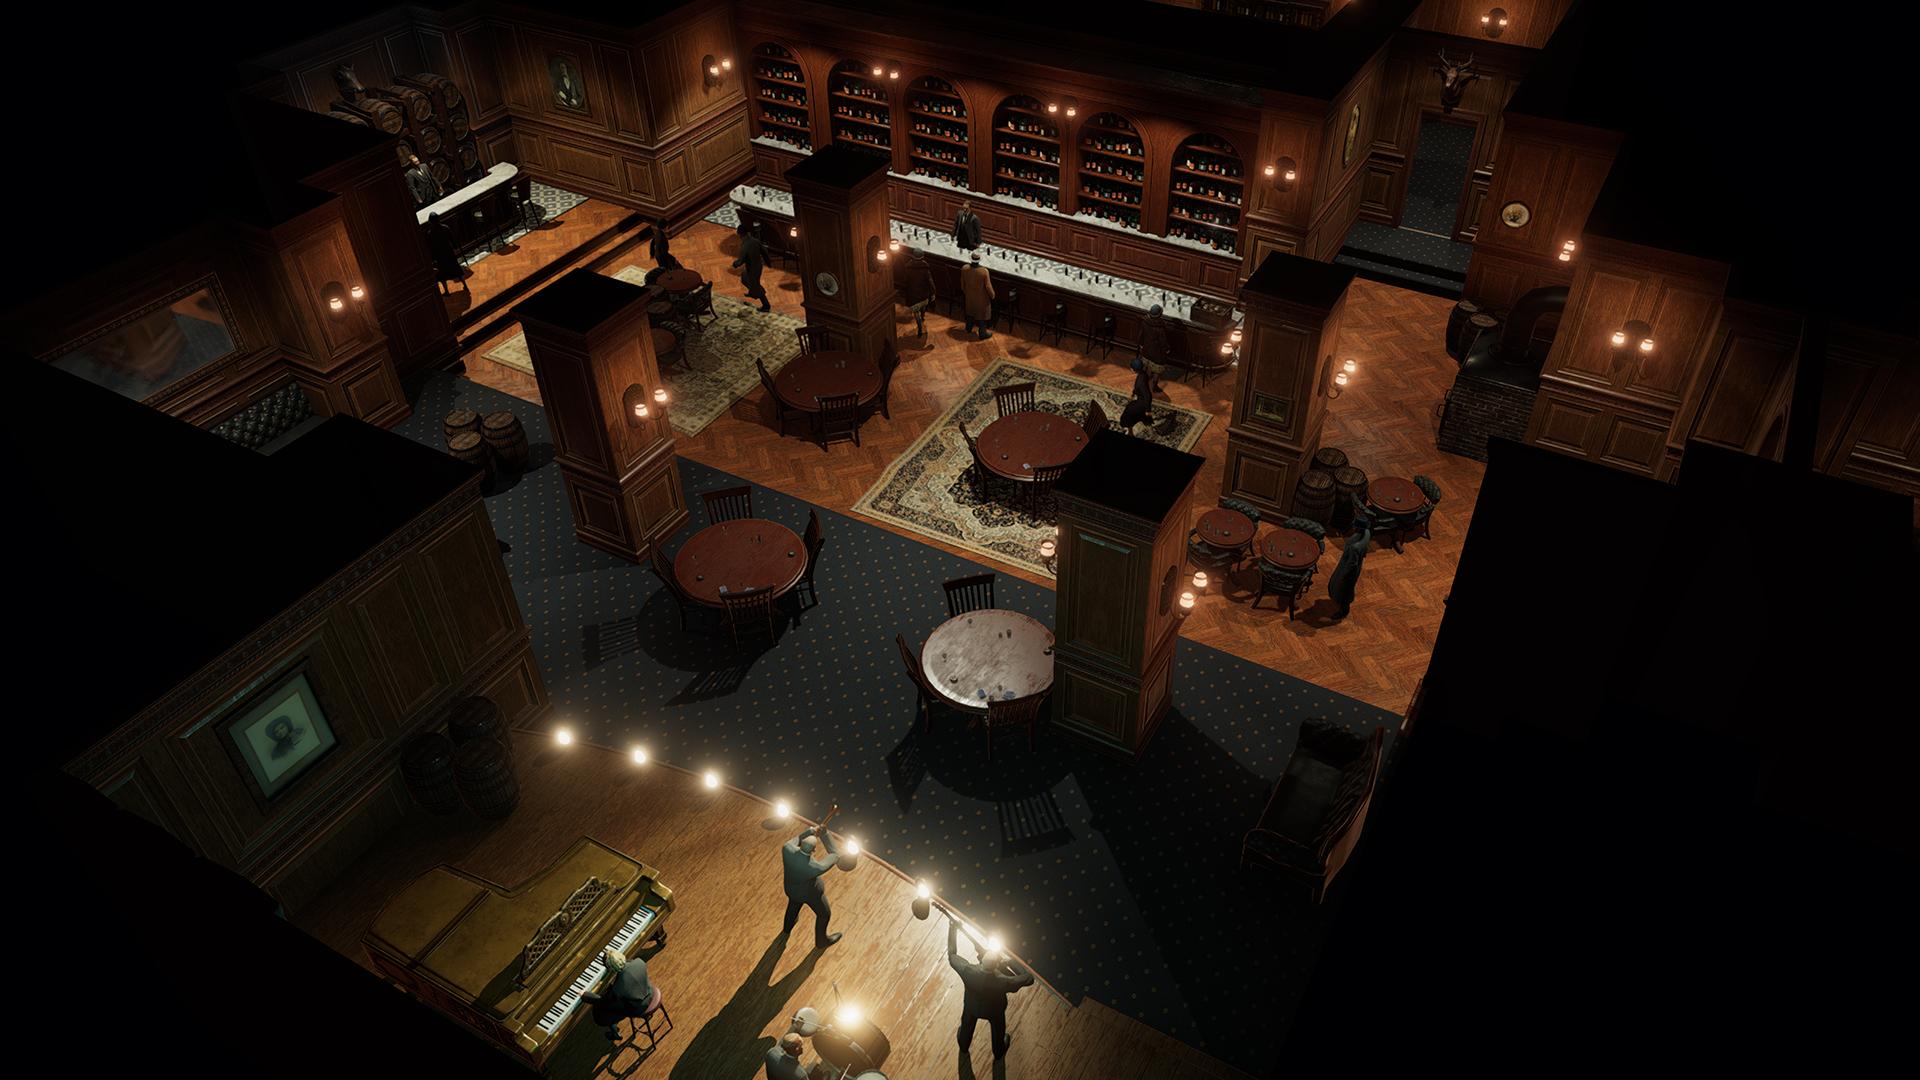 P社新作《罪恶帝国》上架Steam 操控芝加哥黑帮大权